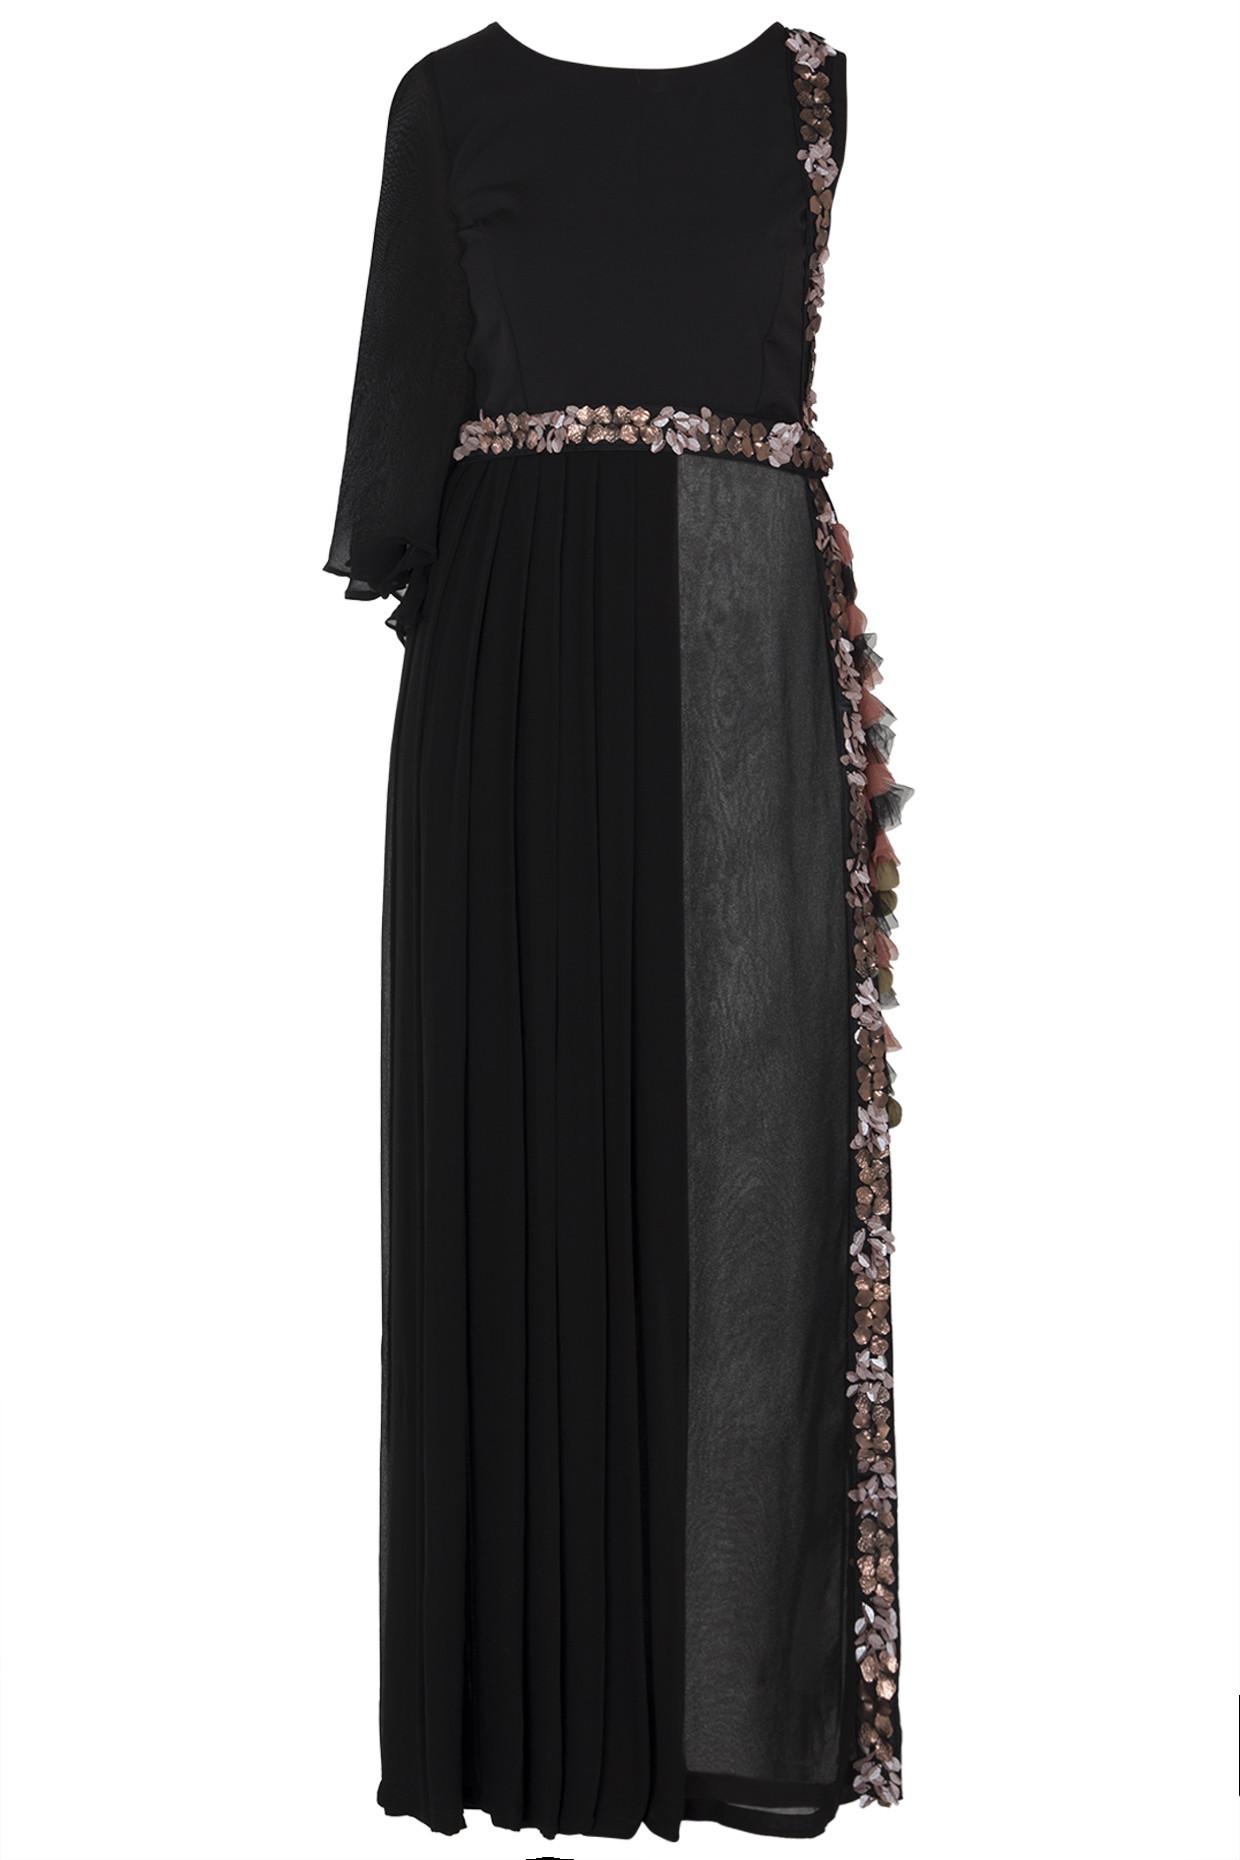 Black One Side Long Dress by Rishi & Vibhuti